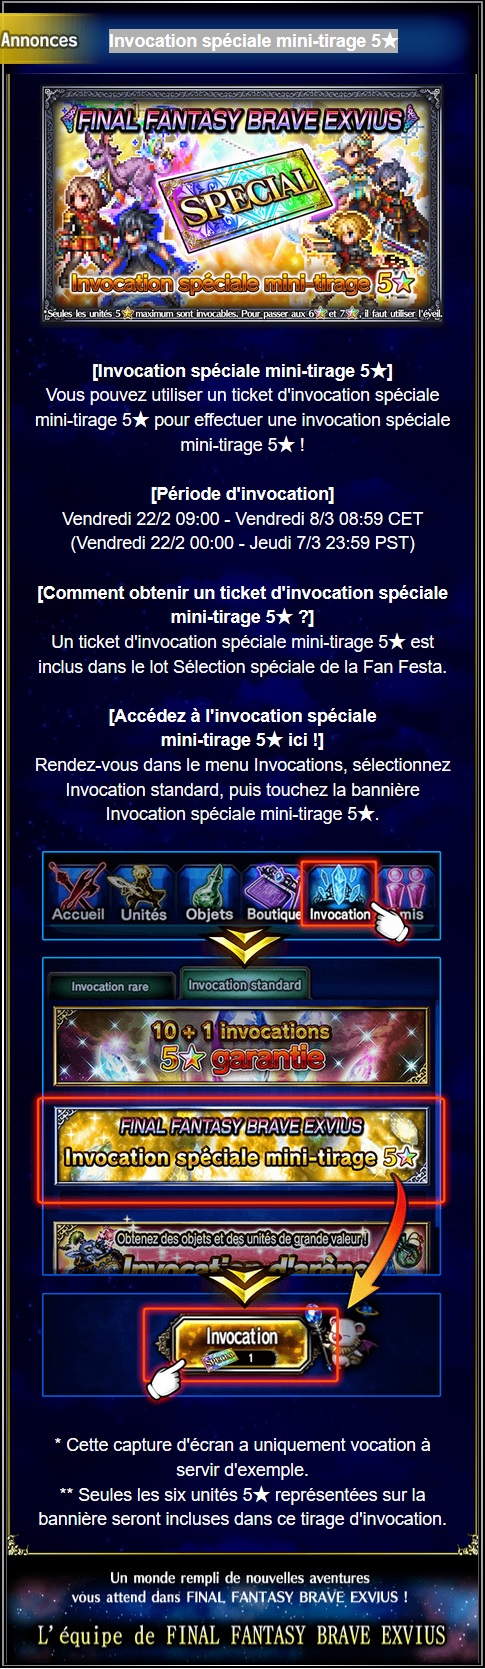 Invocation spéciale mini-tirage 5★ - du 22/02 au 08/03/19 Captu107